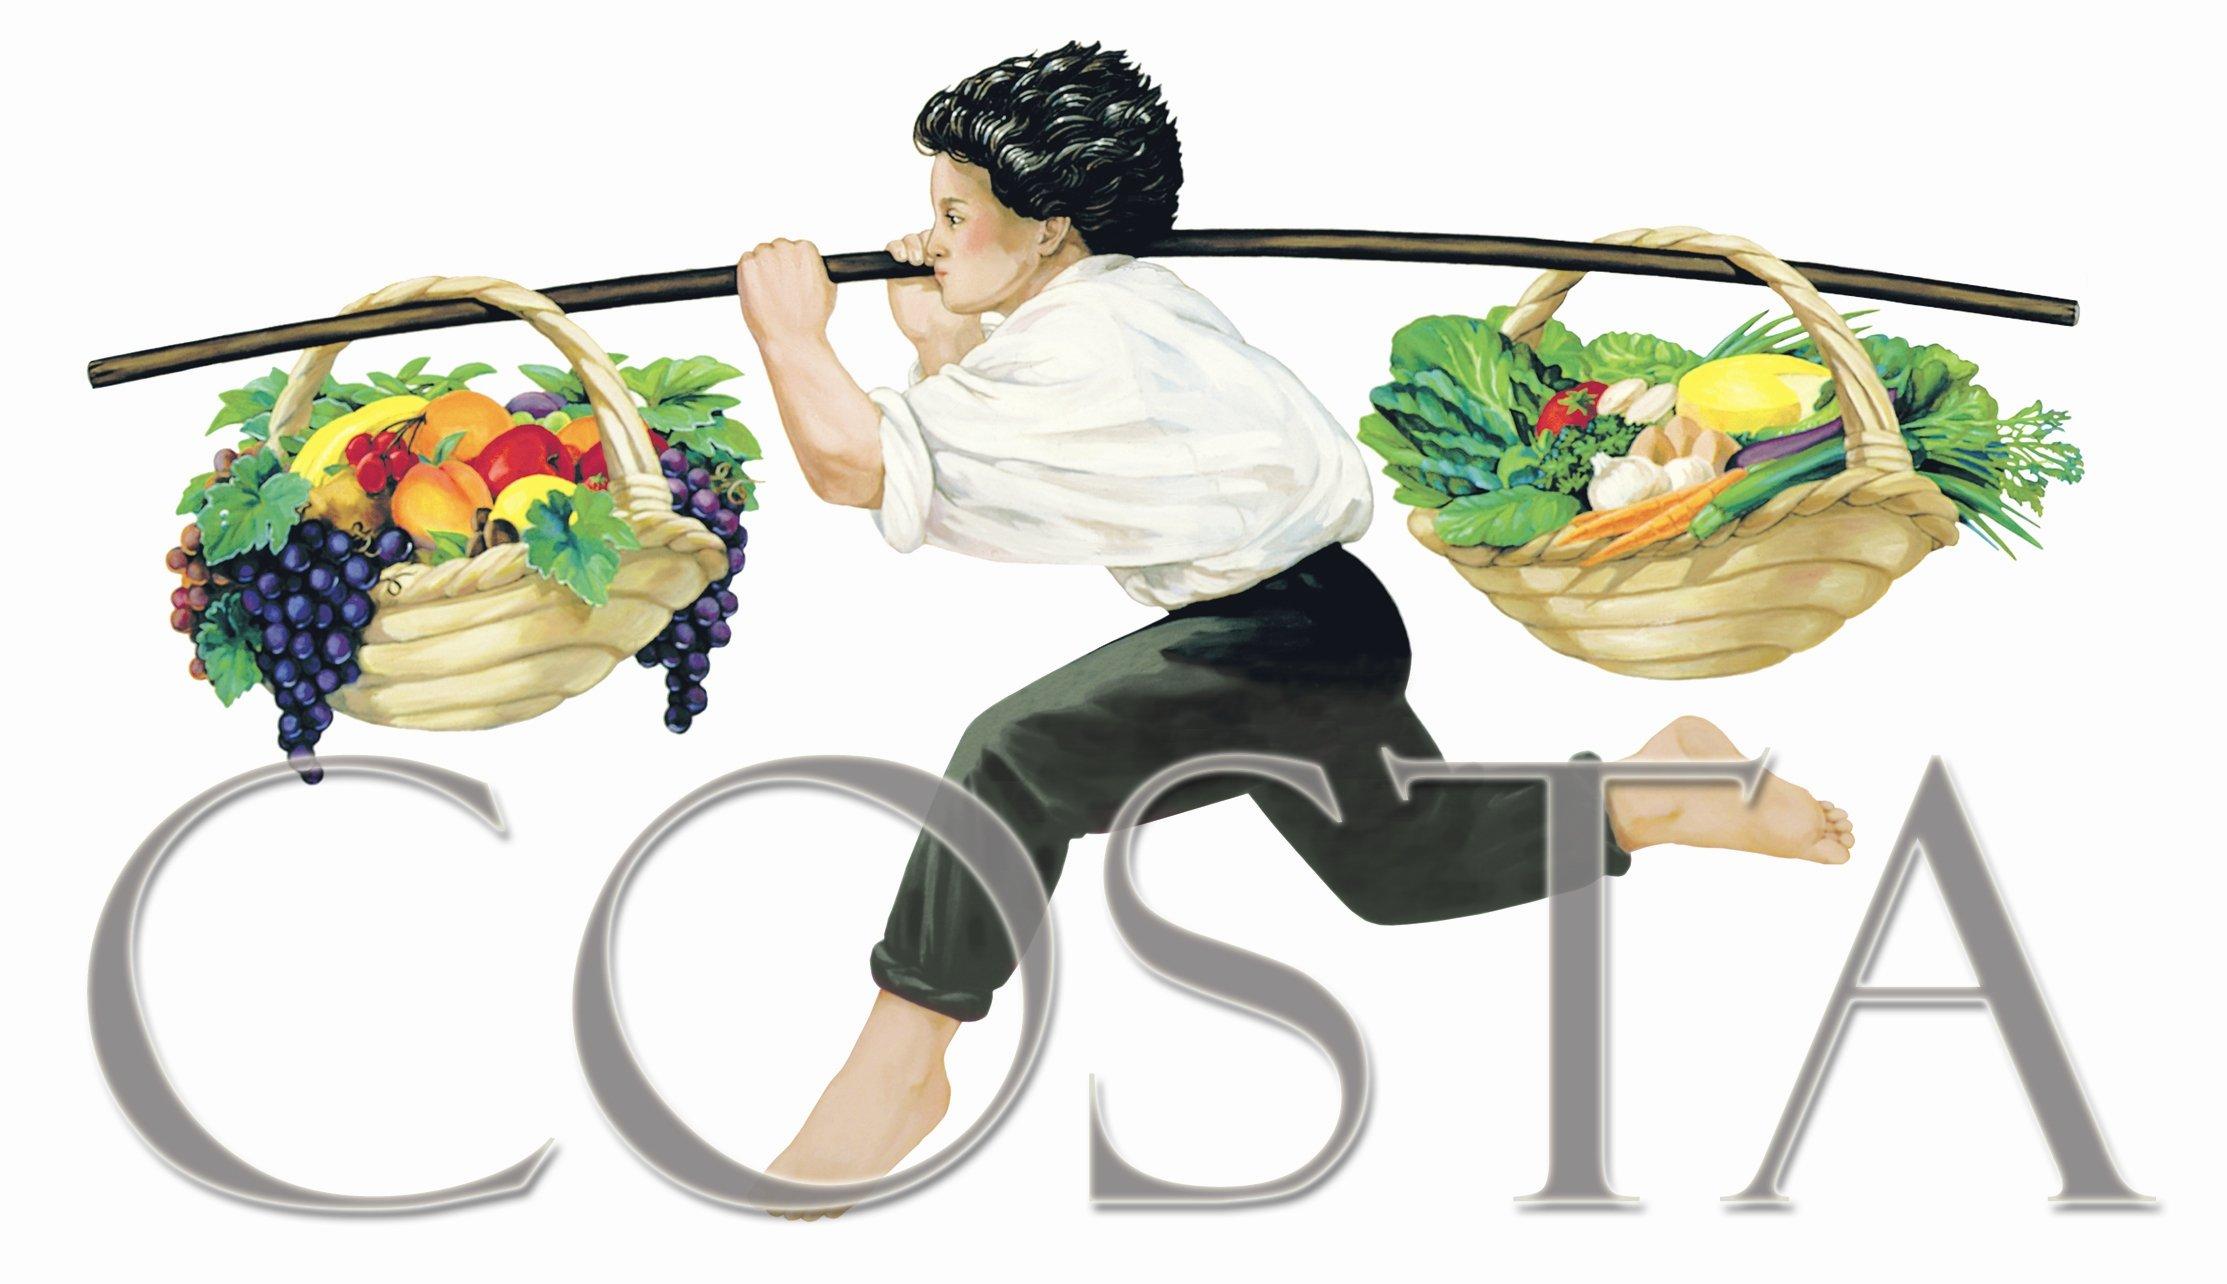 Costa_fruit_produce_logo